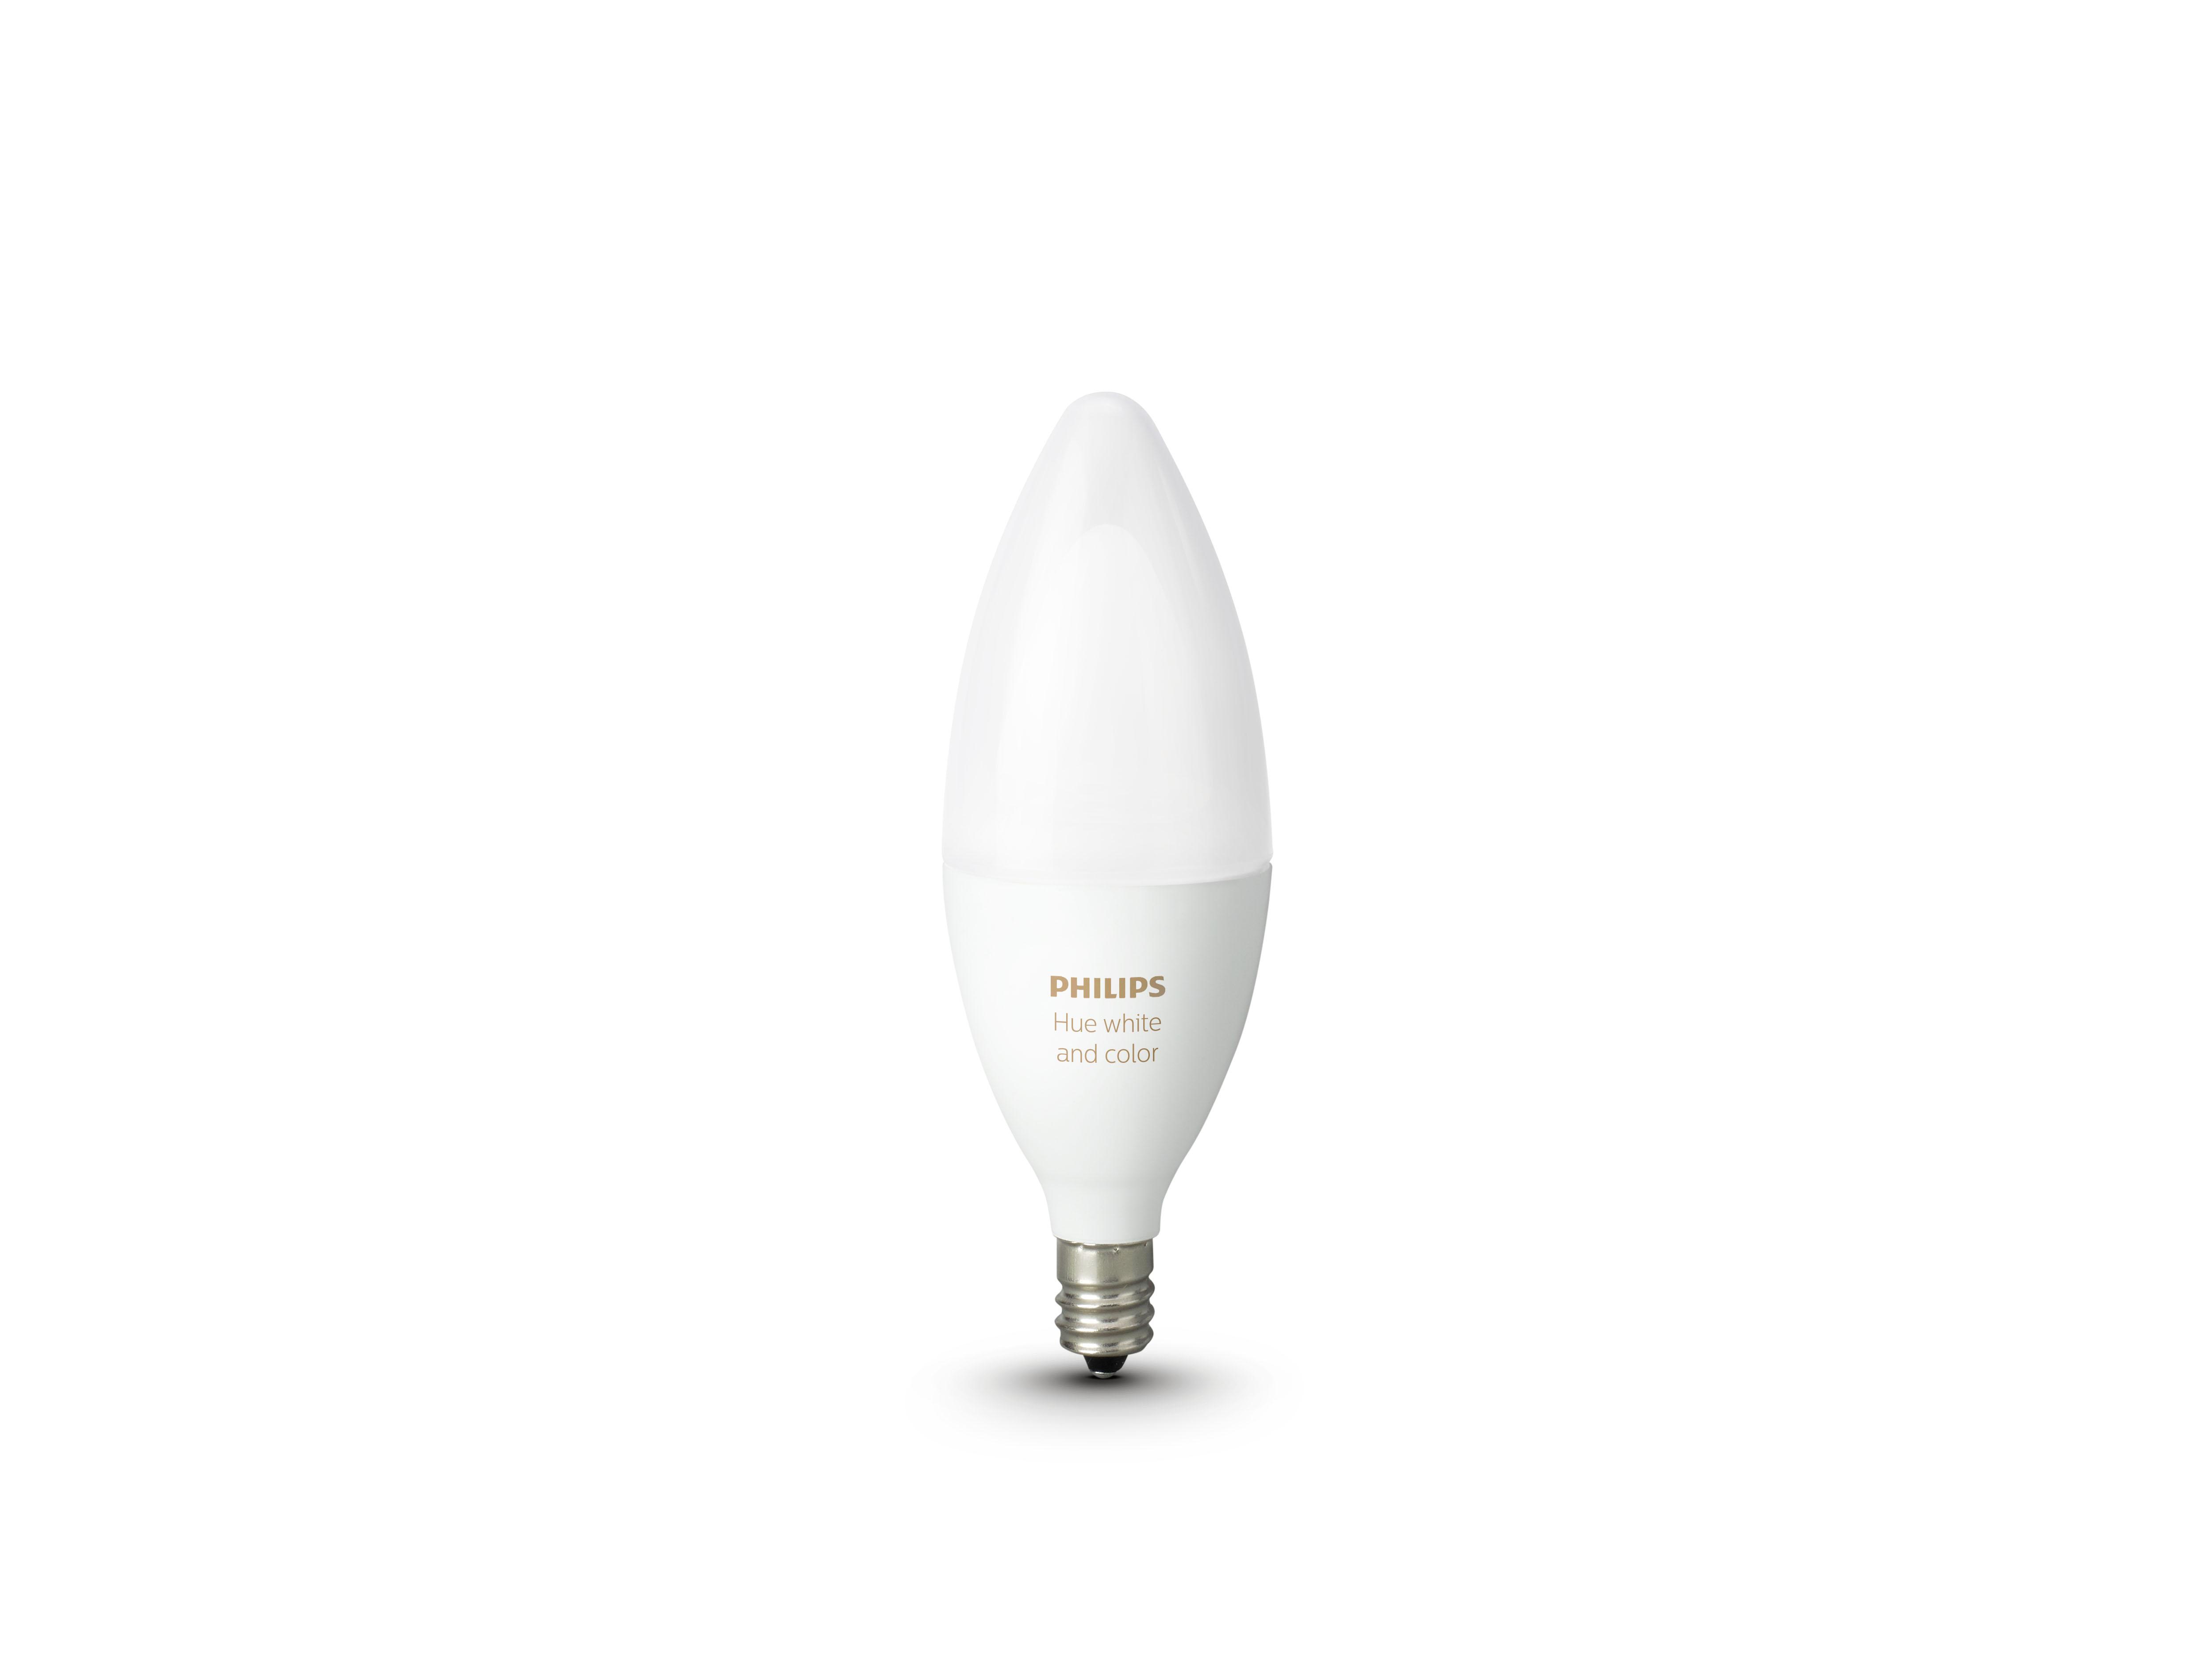 Hue Lampen E14 : Smarte philips hue e lampen news center philips